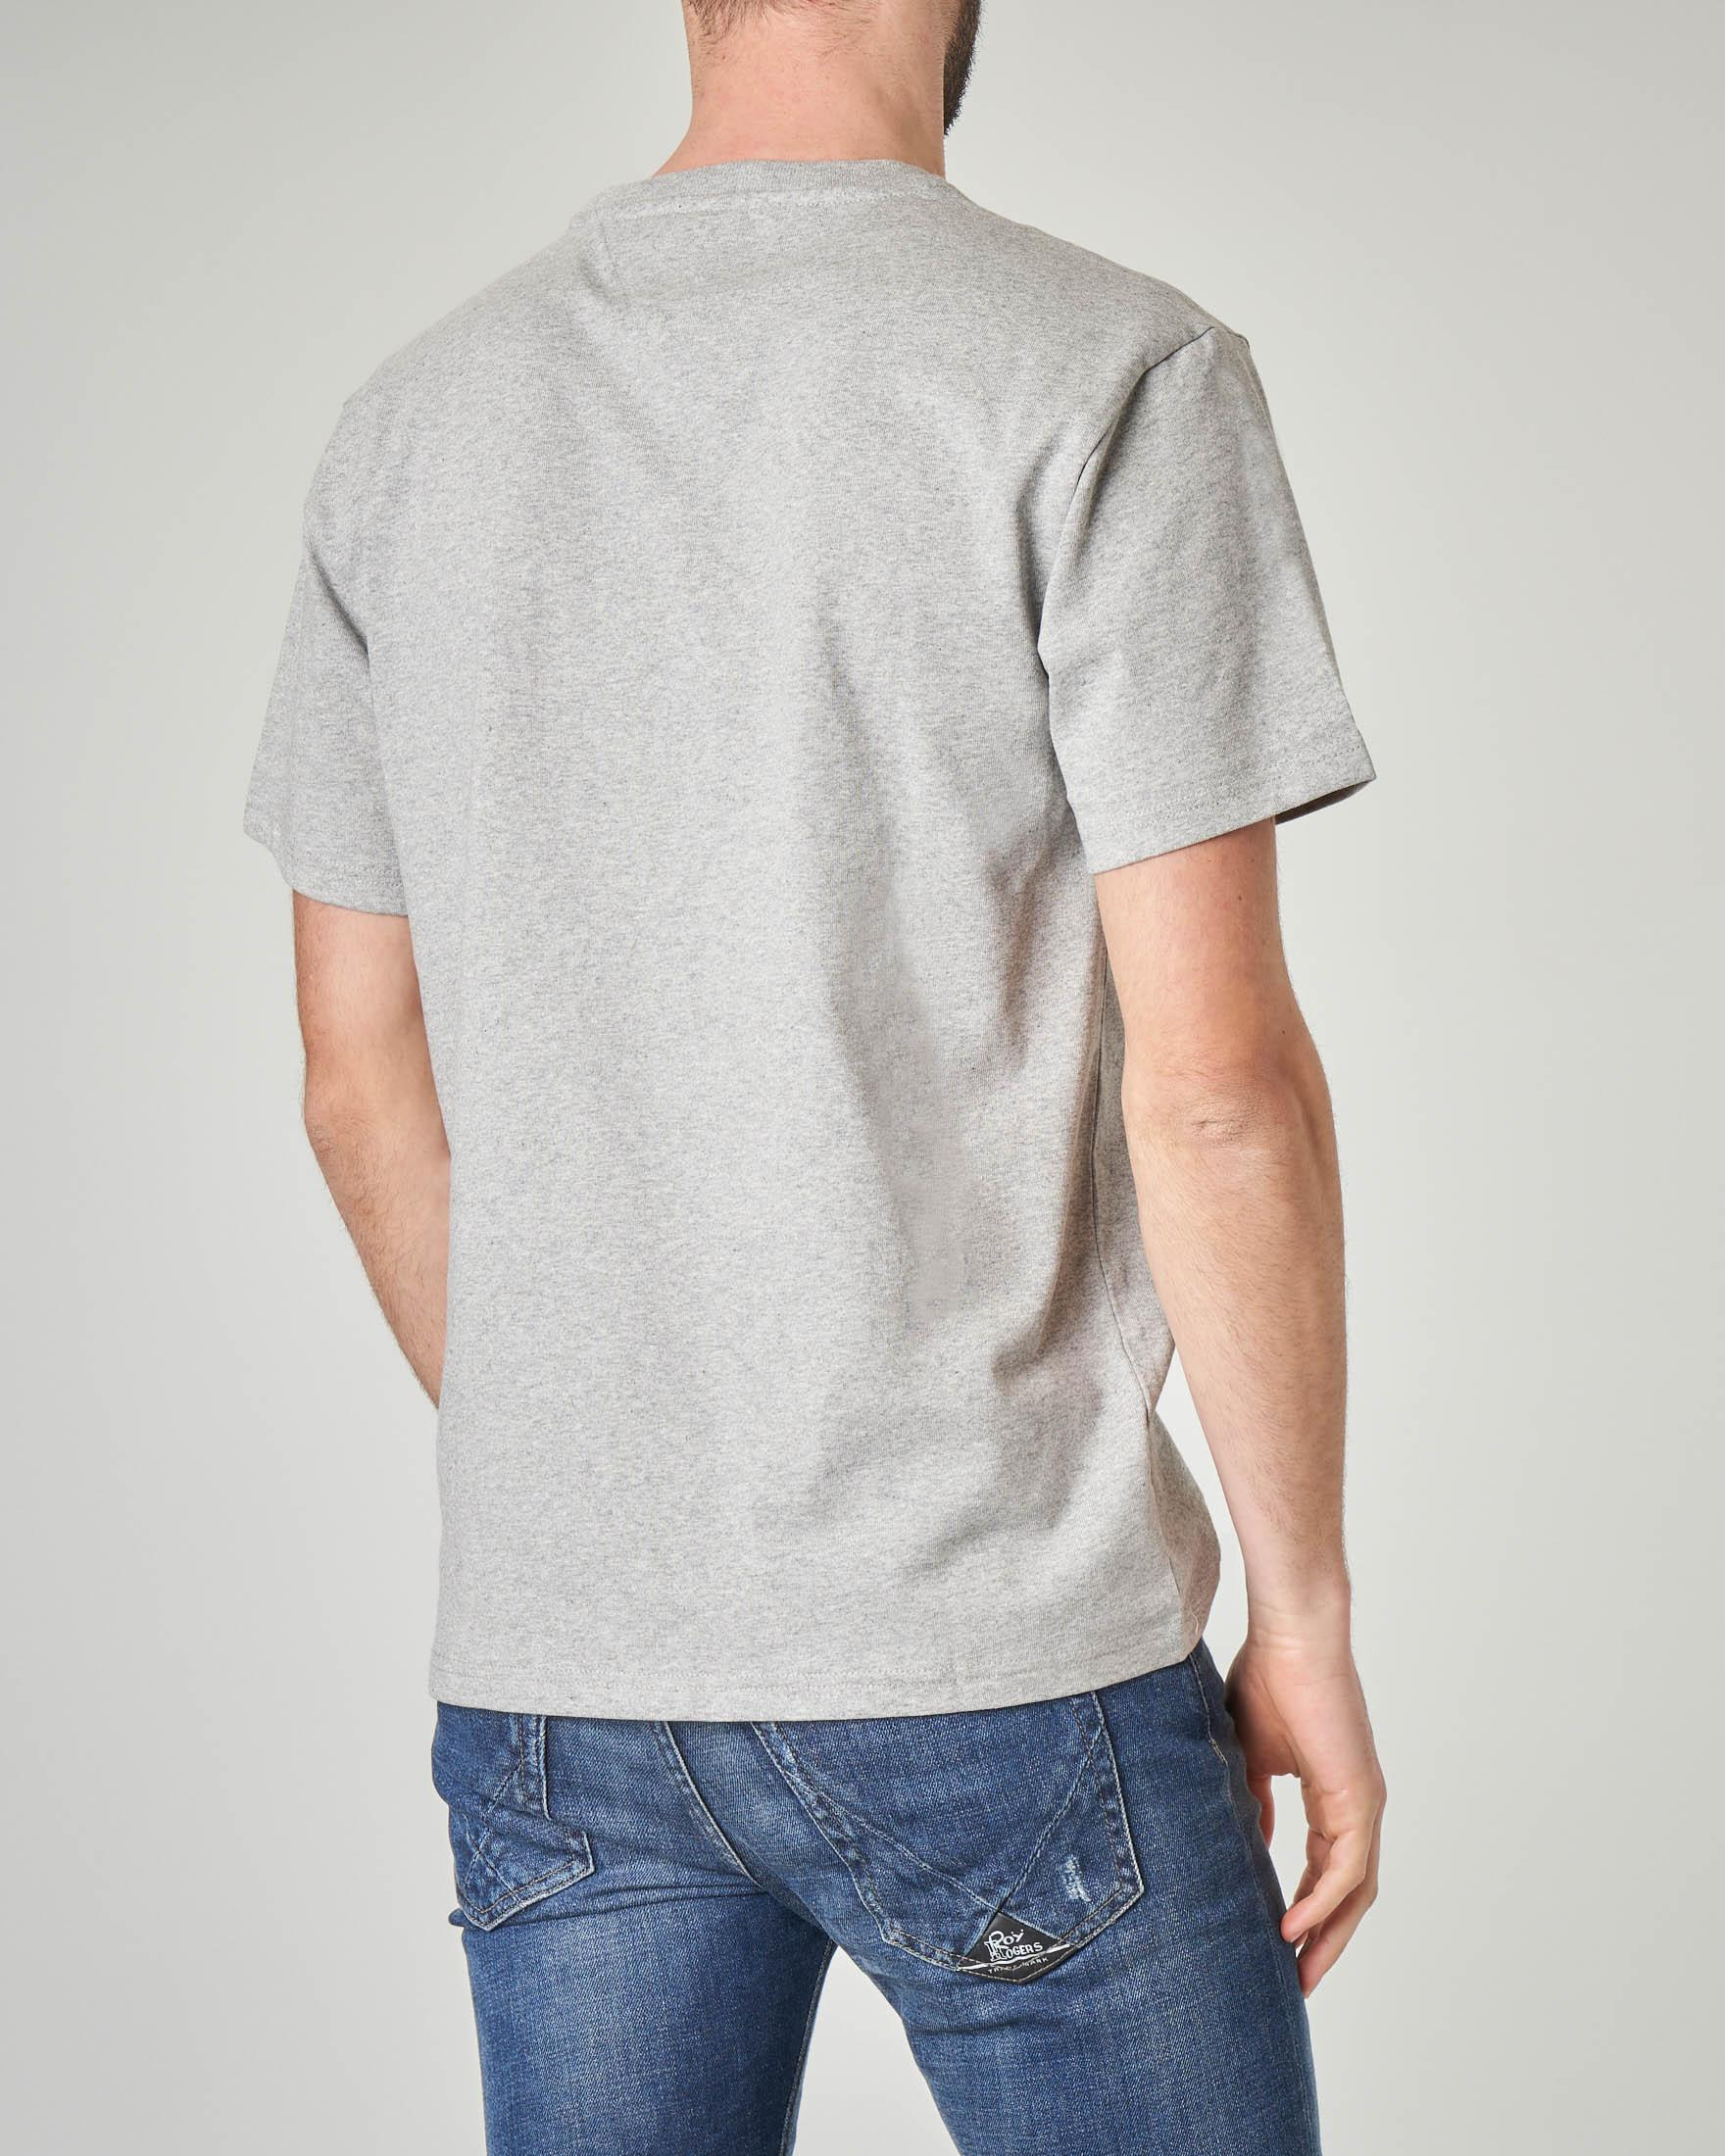 T-shirt grigia con logo college